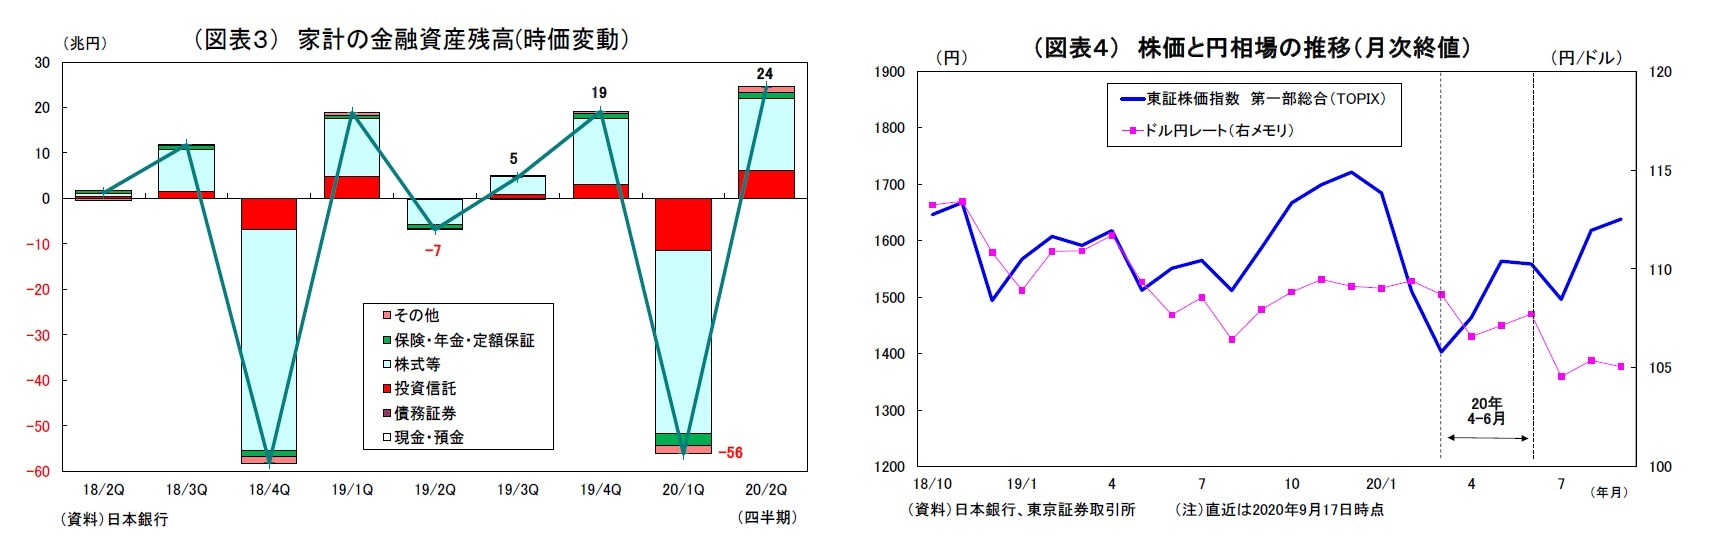 (図表3) 家計の金融資産残高(時価変動)/(図表4) 株価と円相場の推移(月次終値)